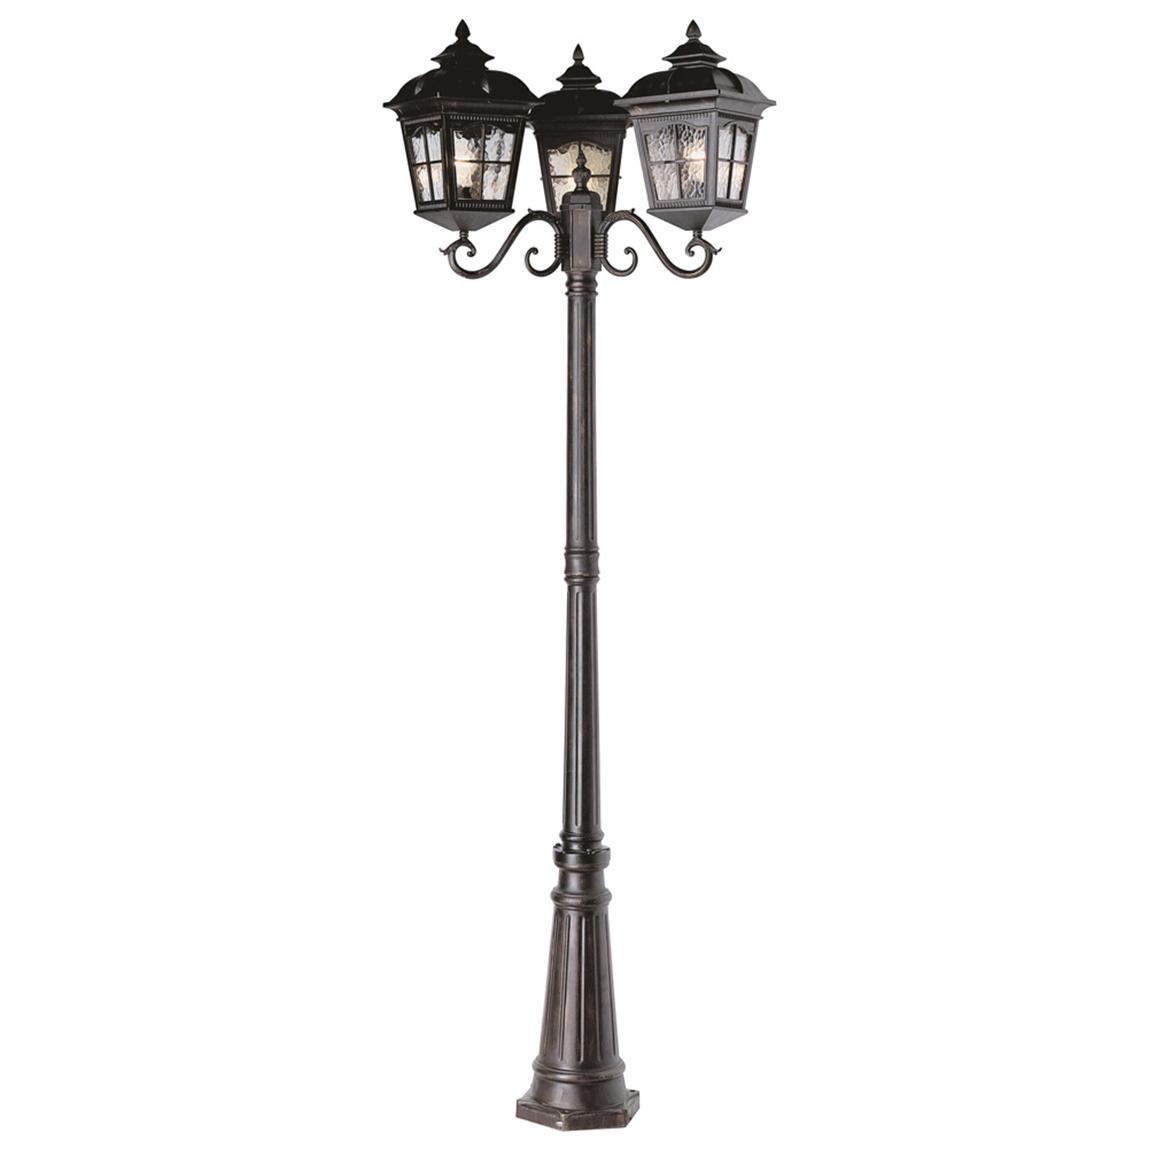 10 Benefits Of 3 Light Pole Lamp